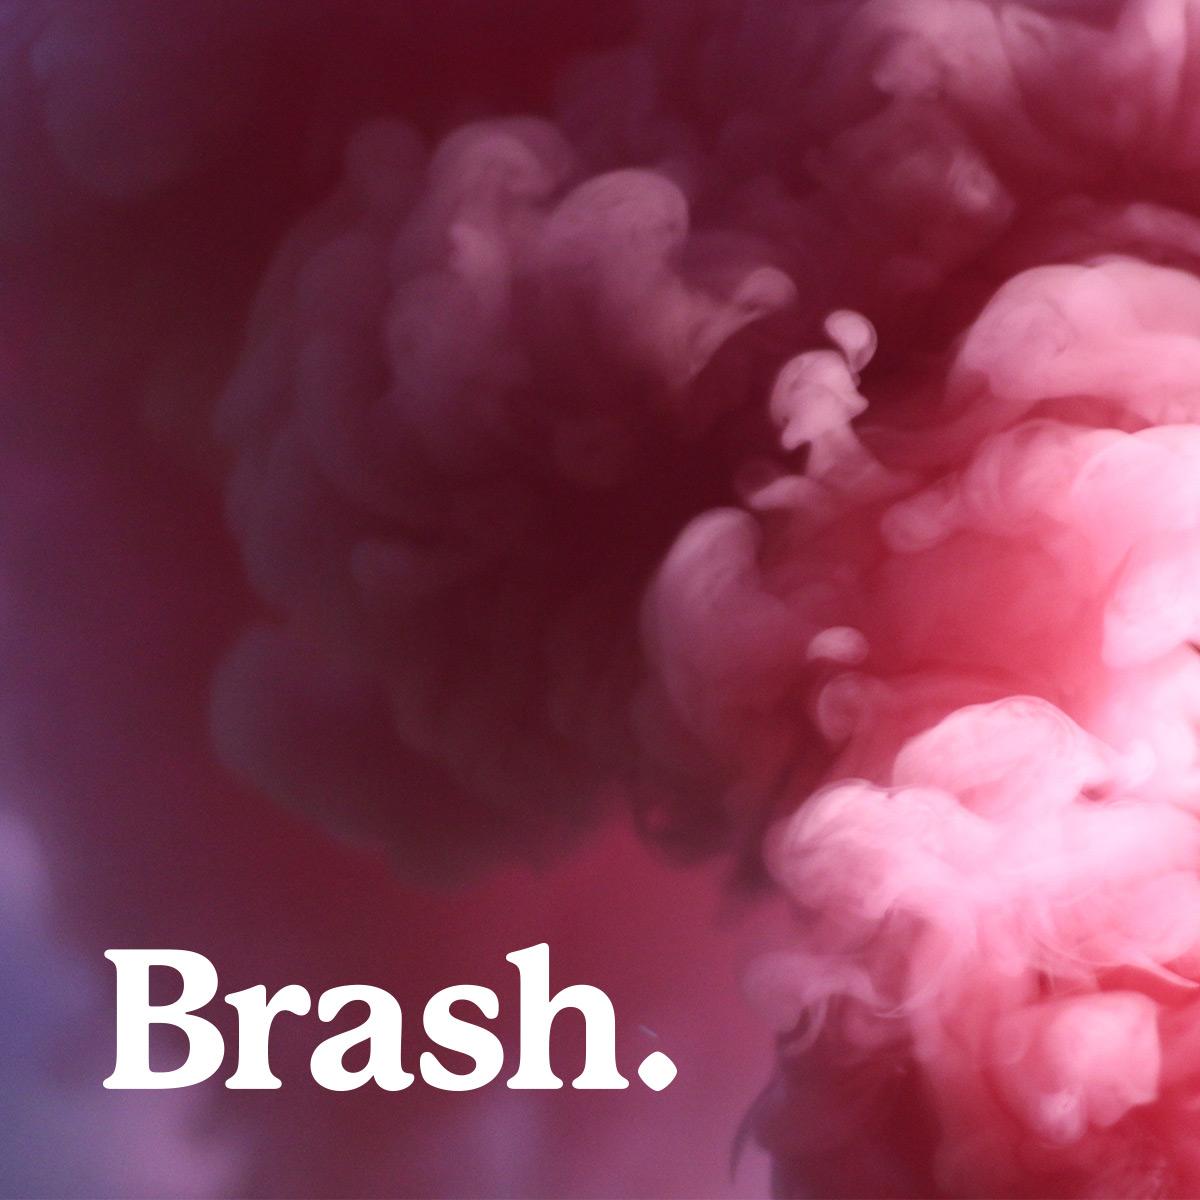 Brash.